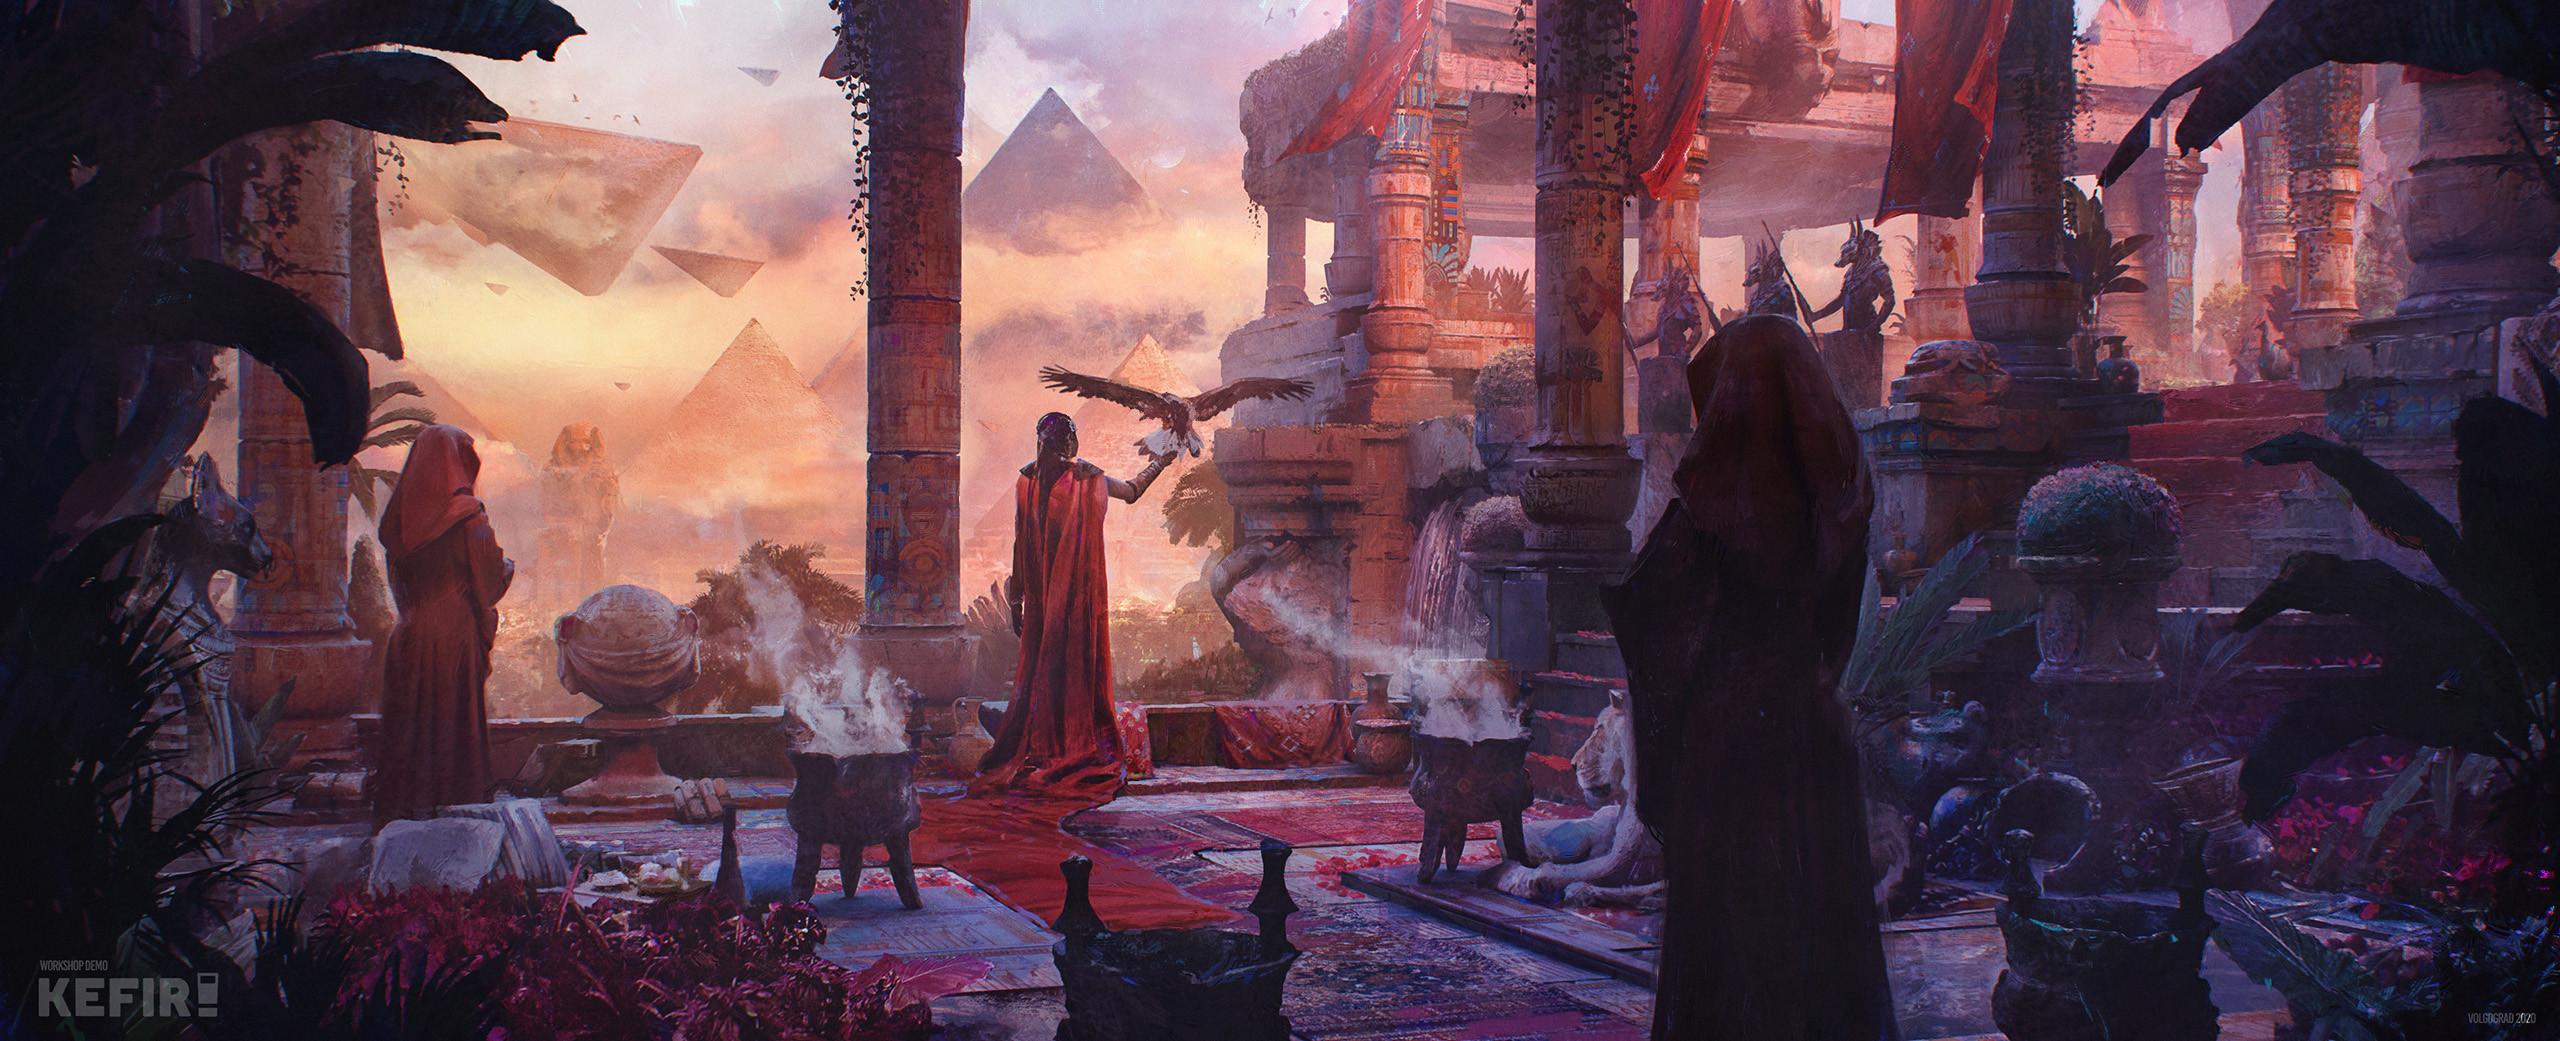 "Concept art for the workshop ""KEFIR"" studio worldbuilding design photoshop ancient fantasy"